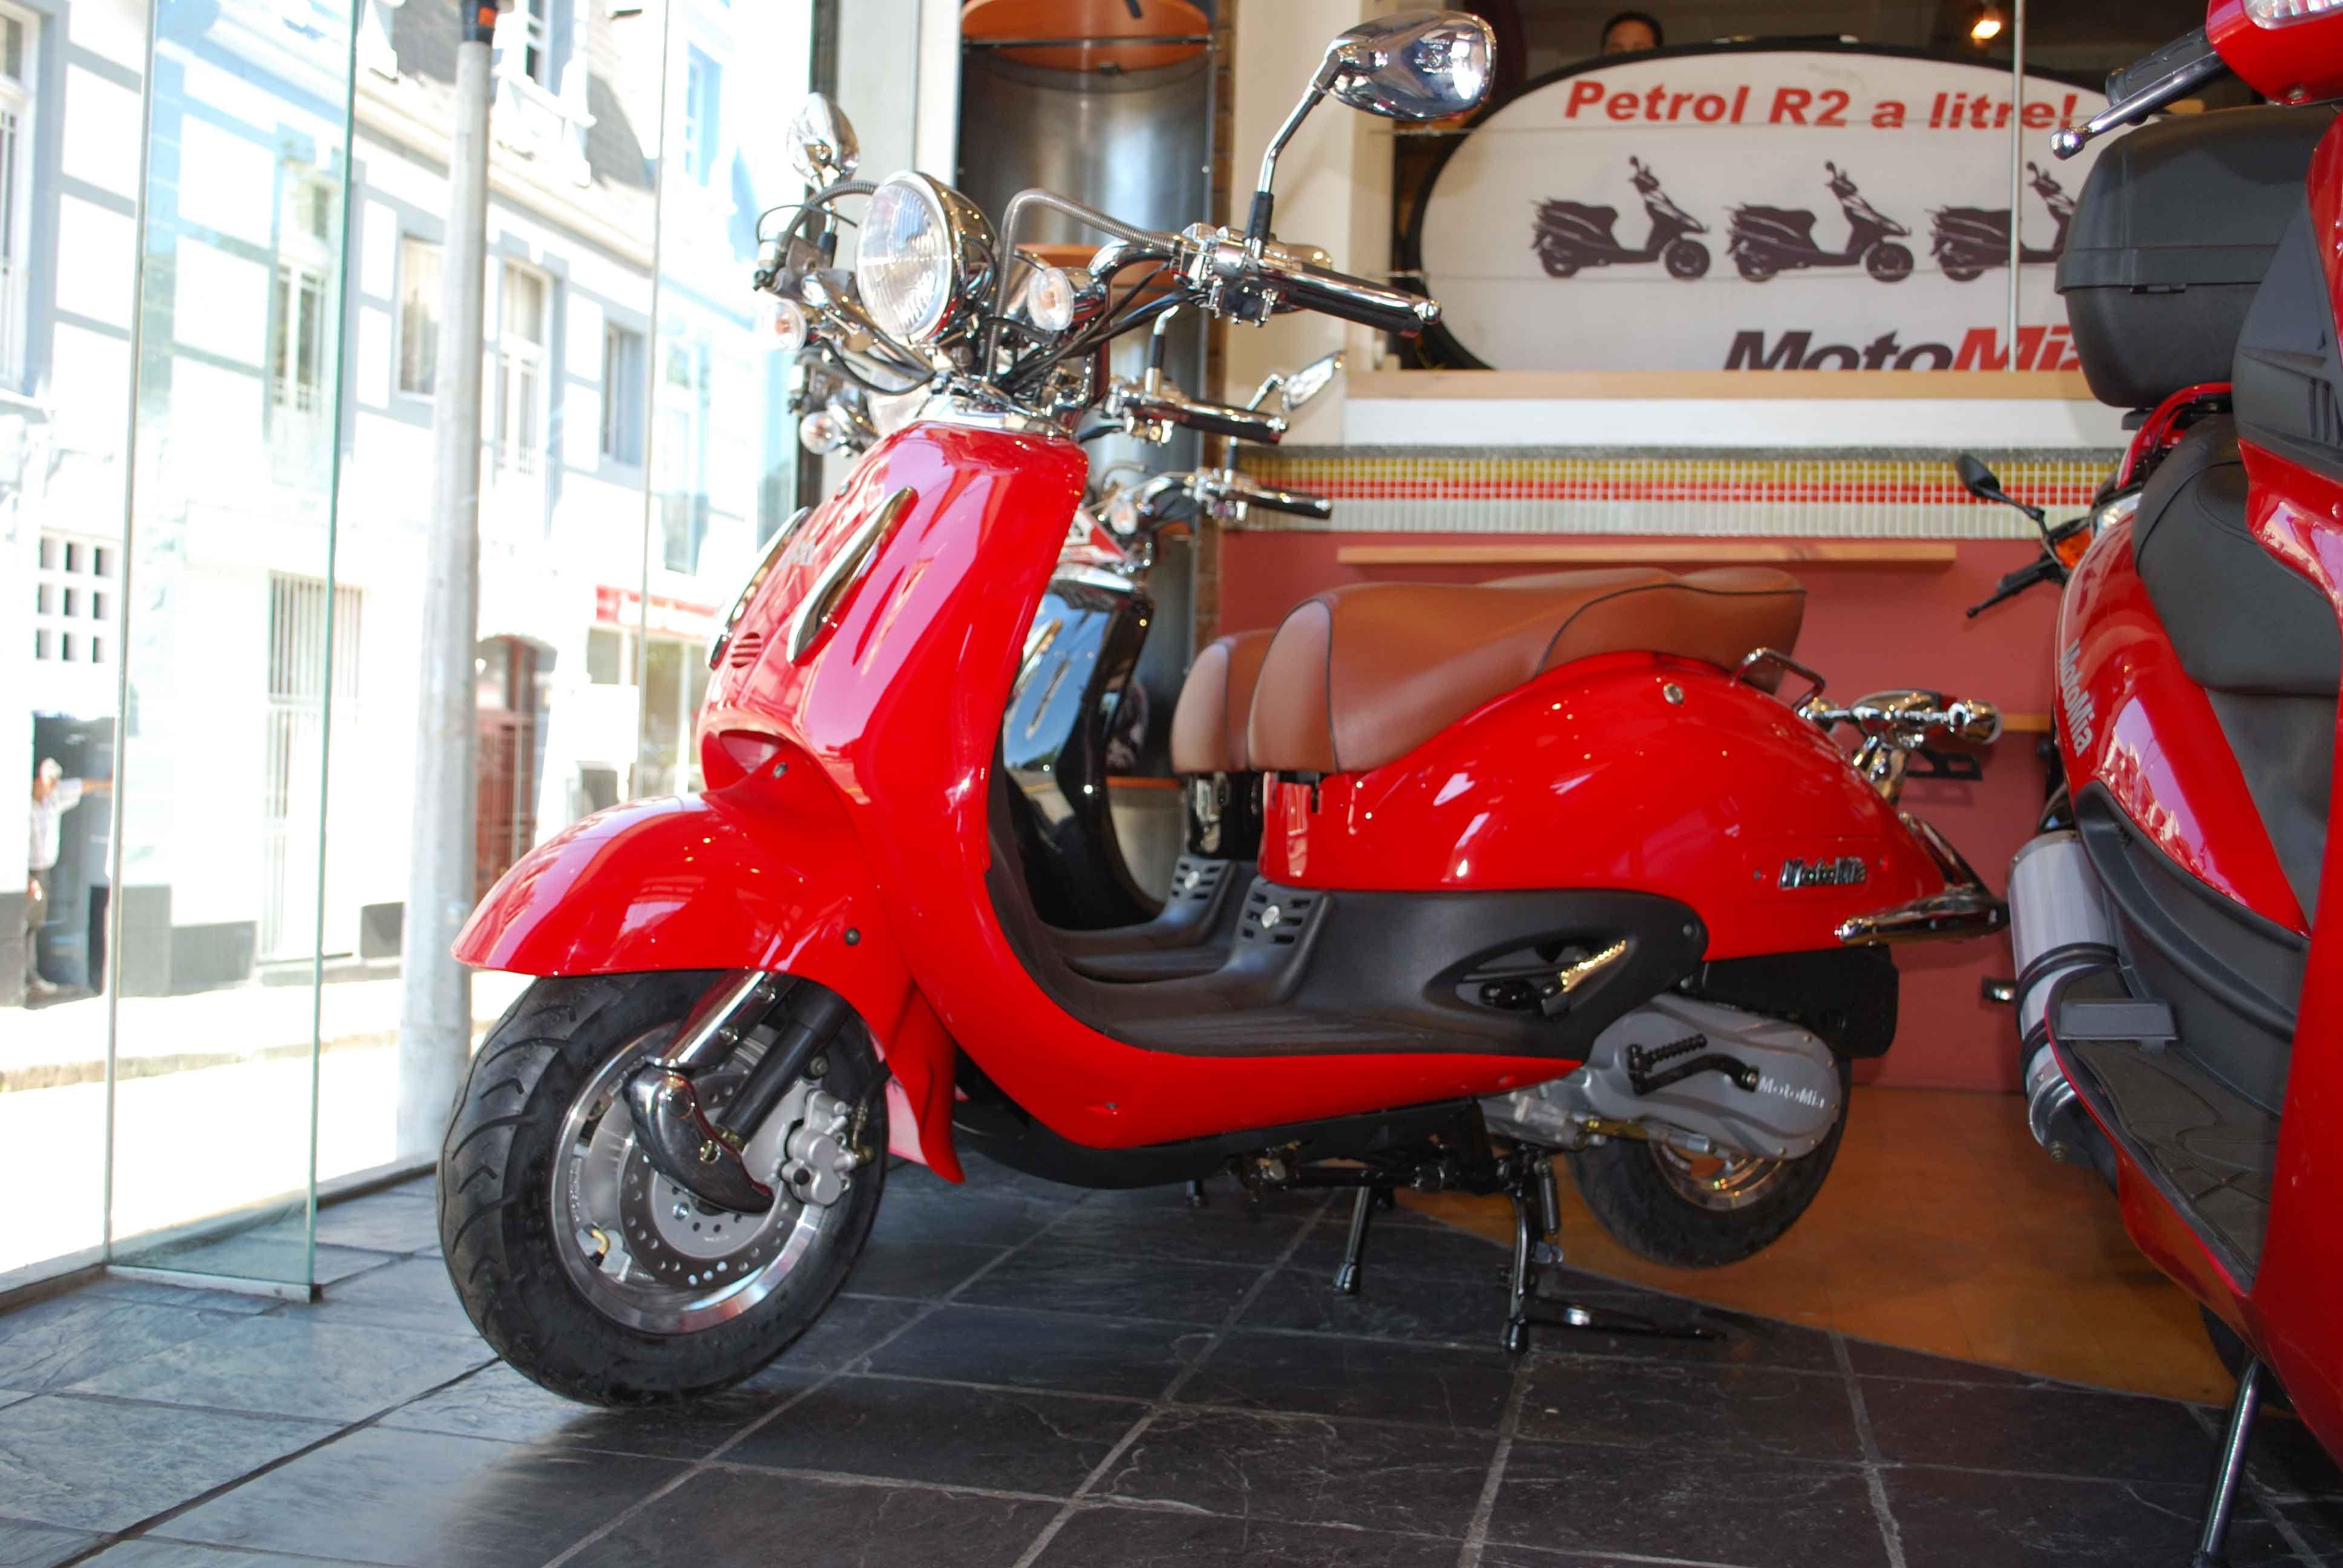 milano 150cc #scooter #bike #bikes #motorcycles #150cc